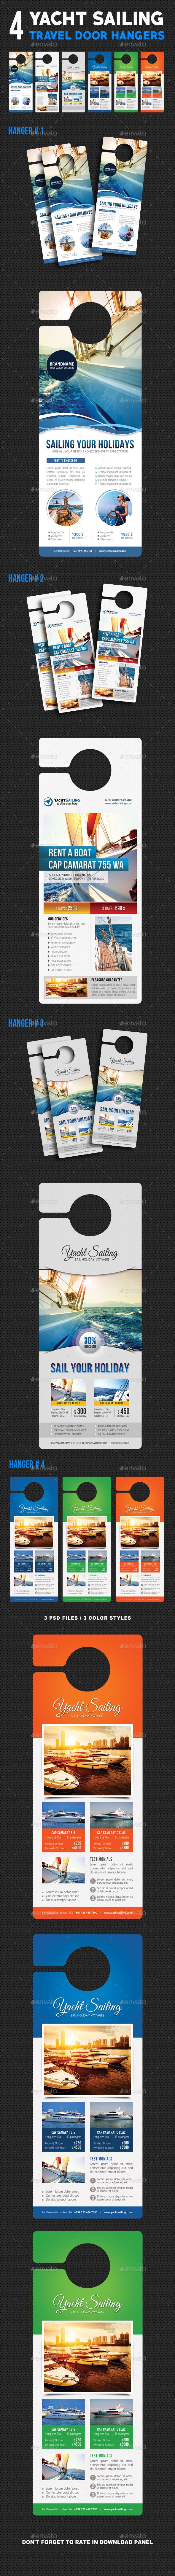 4 Sailing Yacht Travel Door Hanger Bundle - Miscellaneous Print Templates